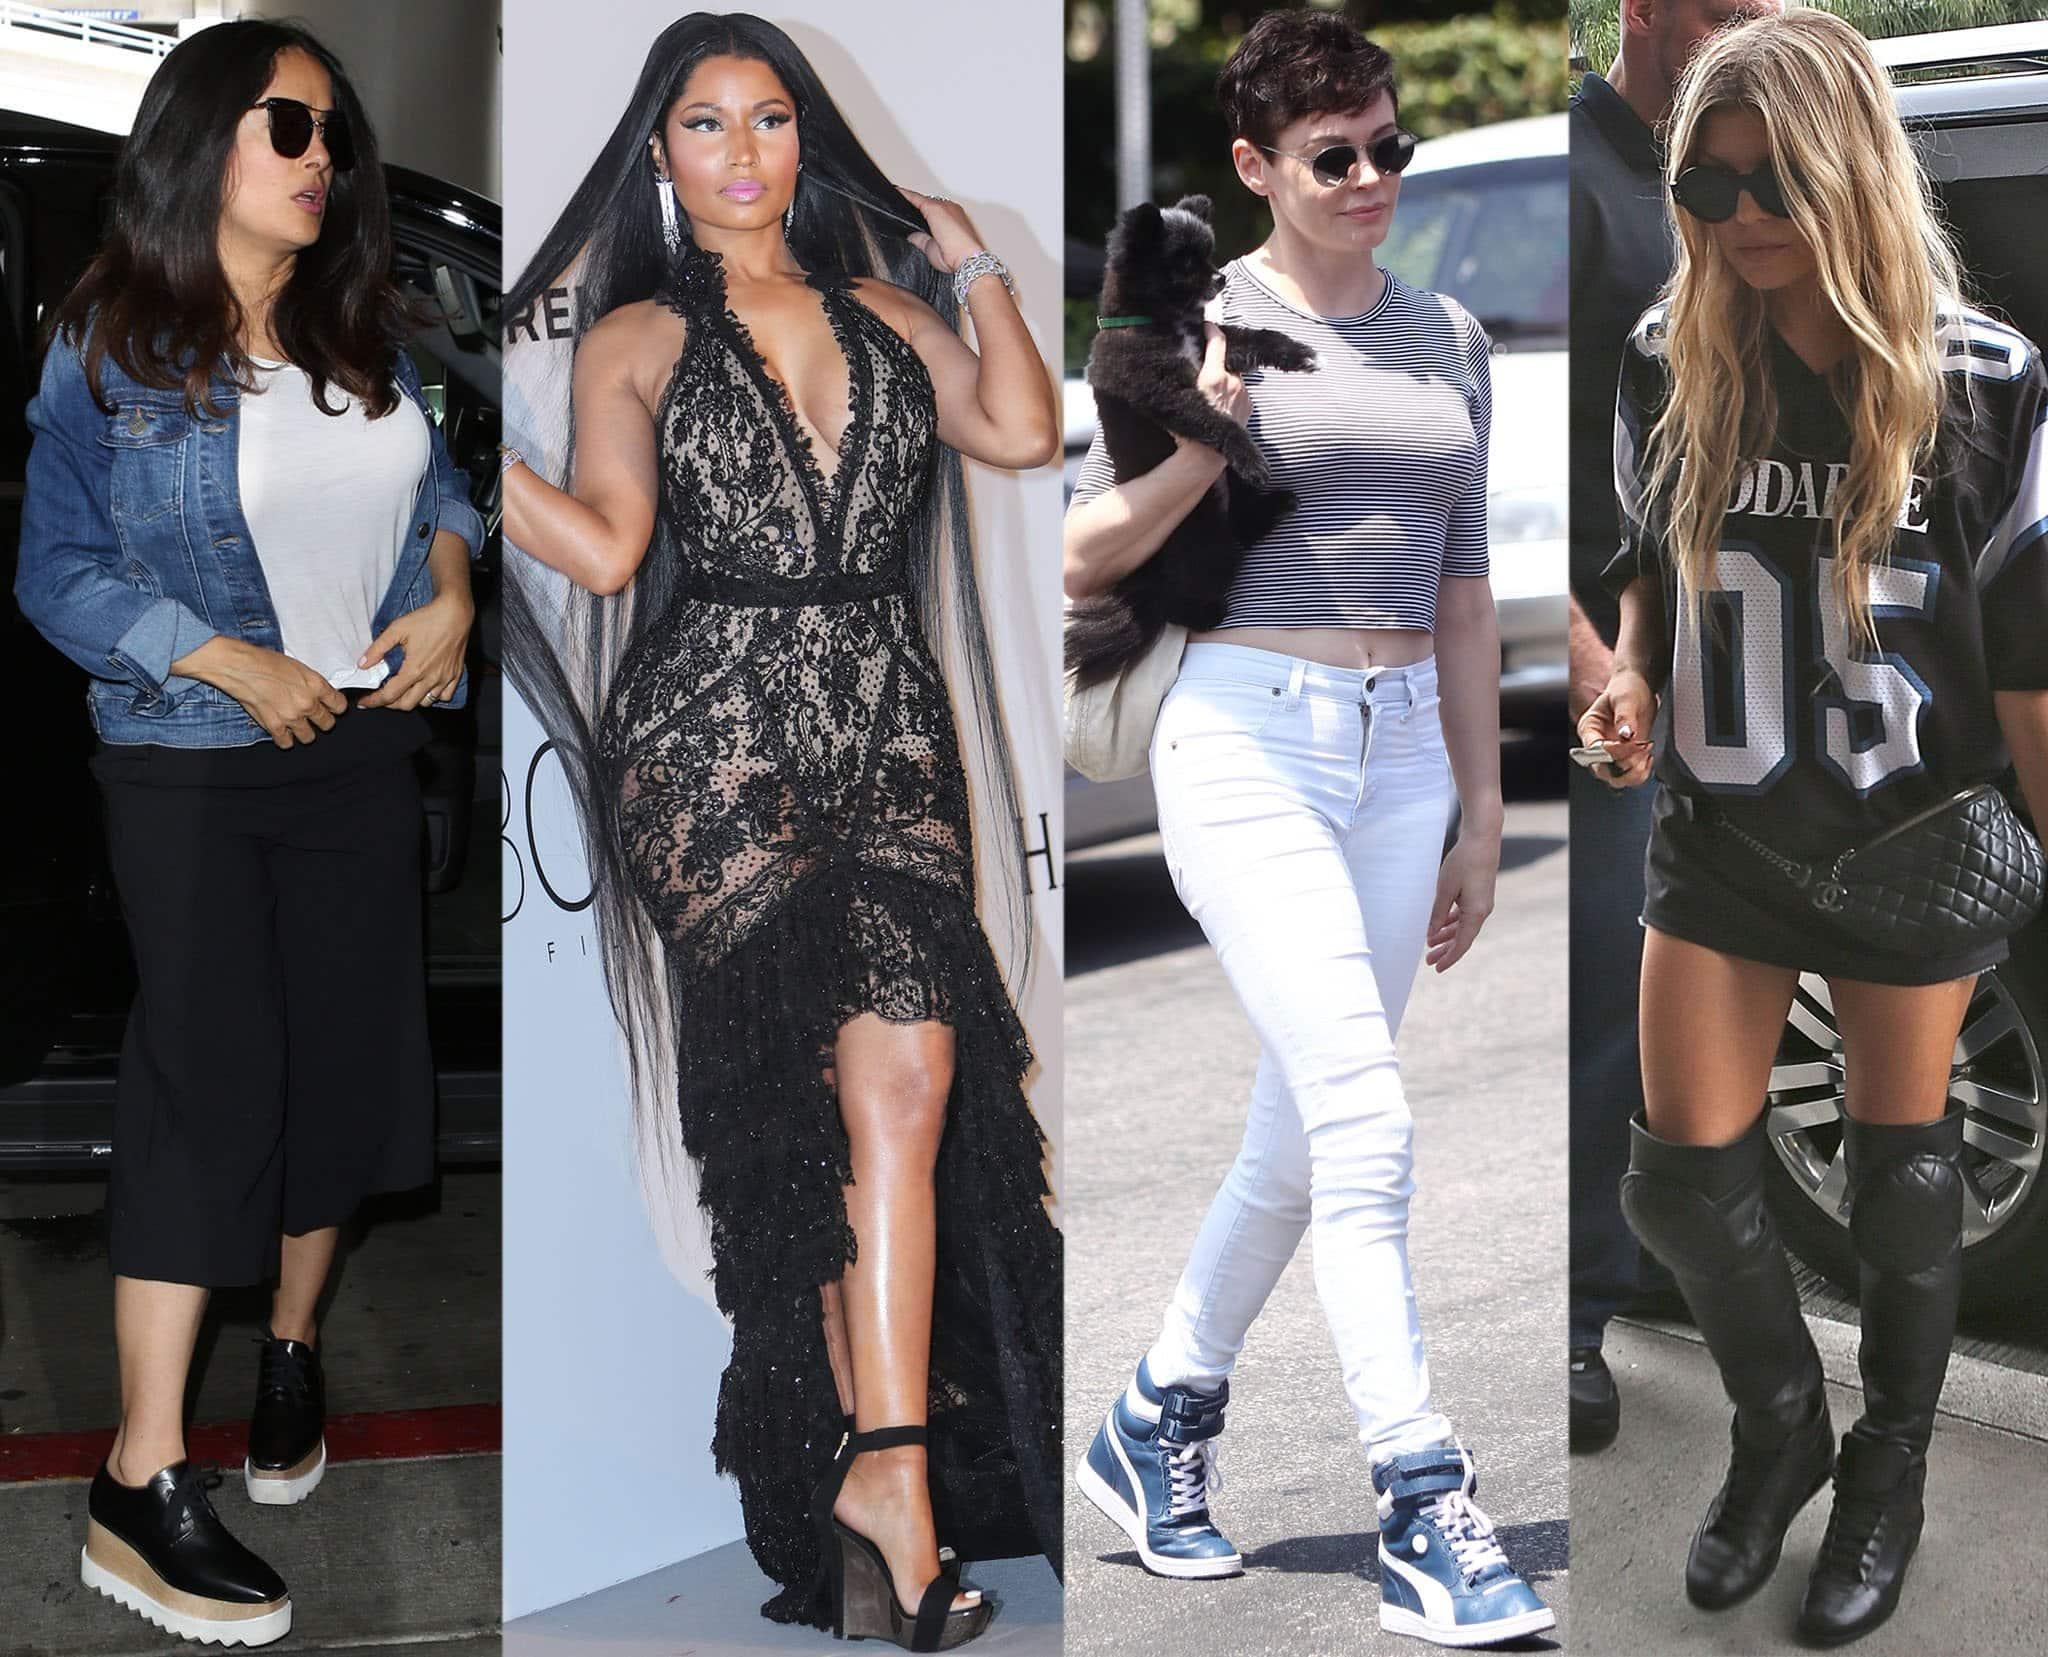 Salma Hayek, Nicki Minaj, Rose McGowan, and Fergie add a few inches with comfy wedges